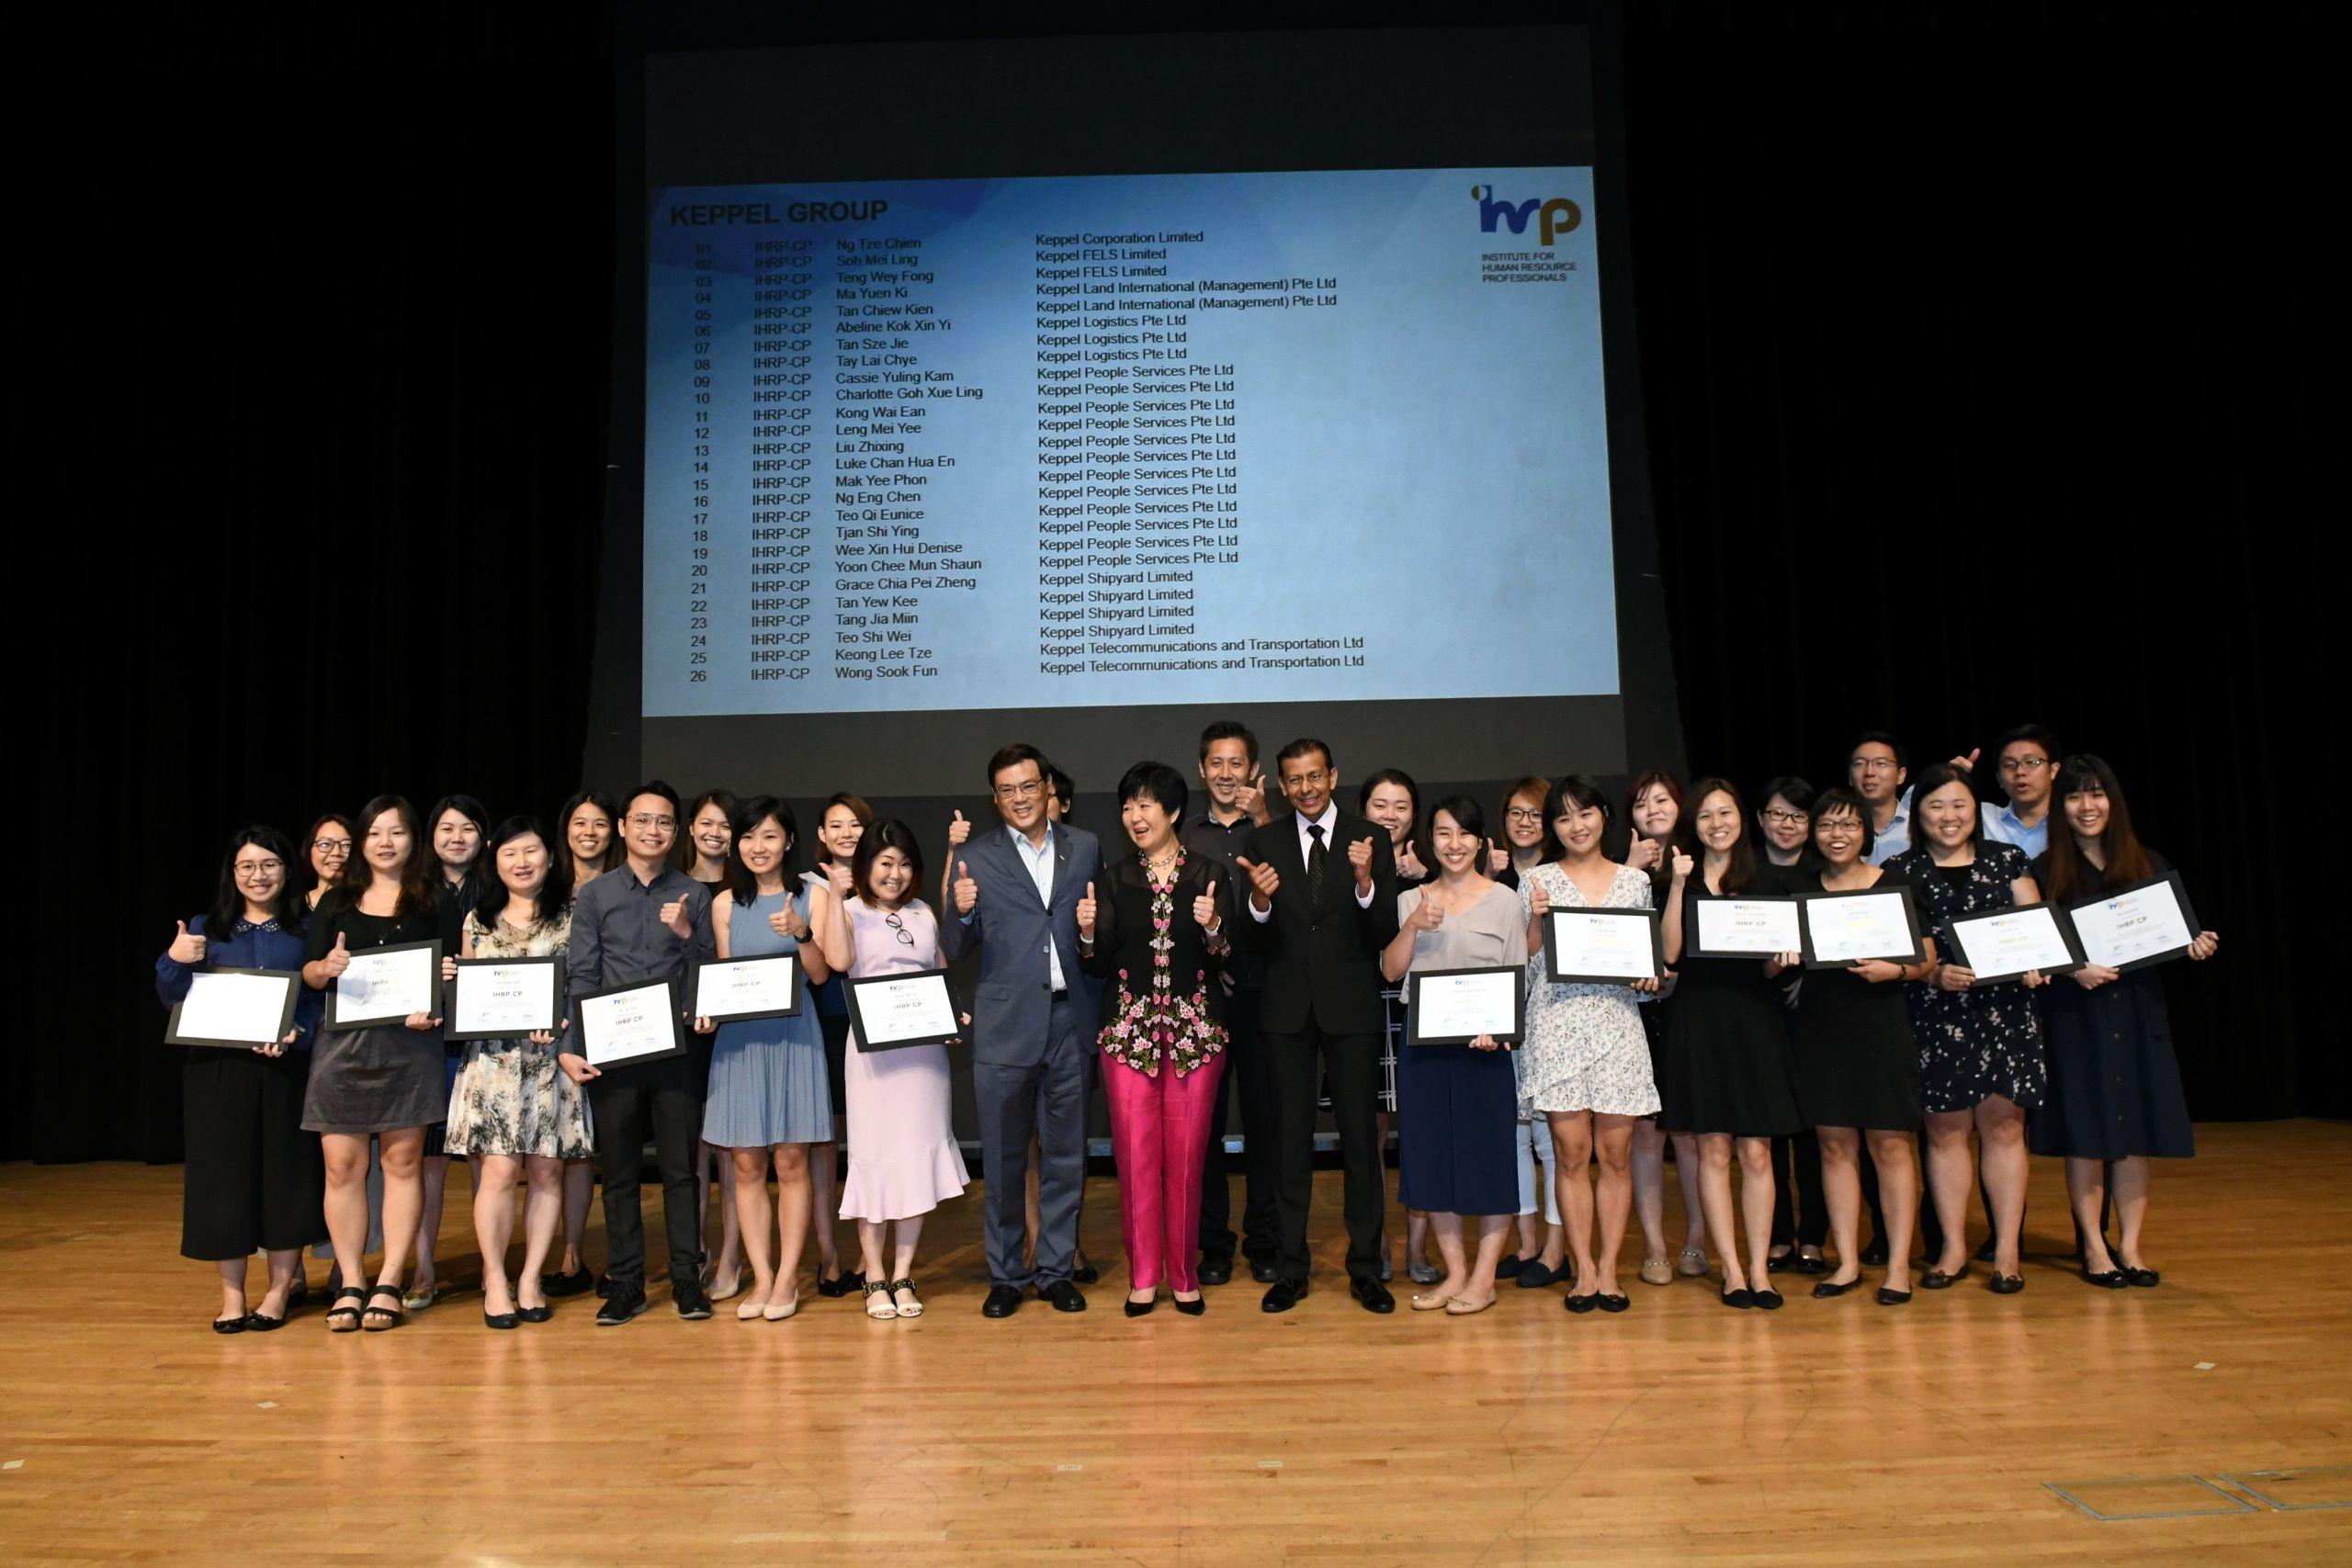 IHRP Oct 2019 conferment ceremony photos 1